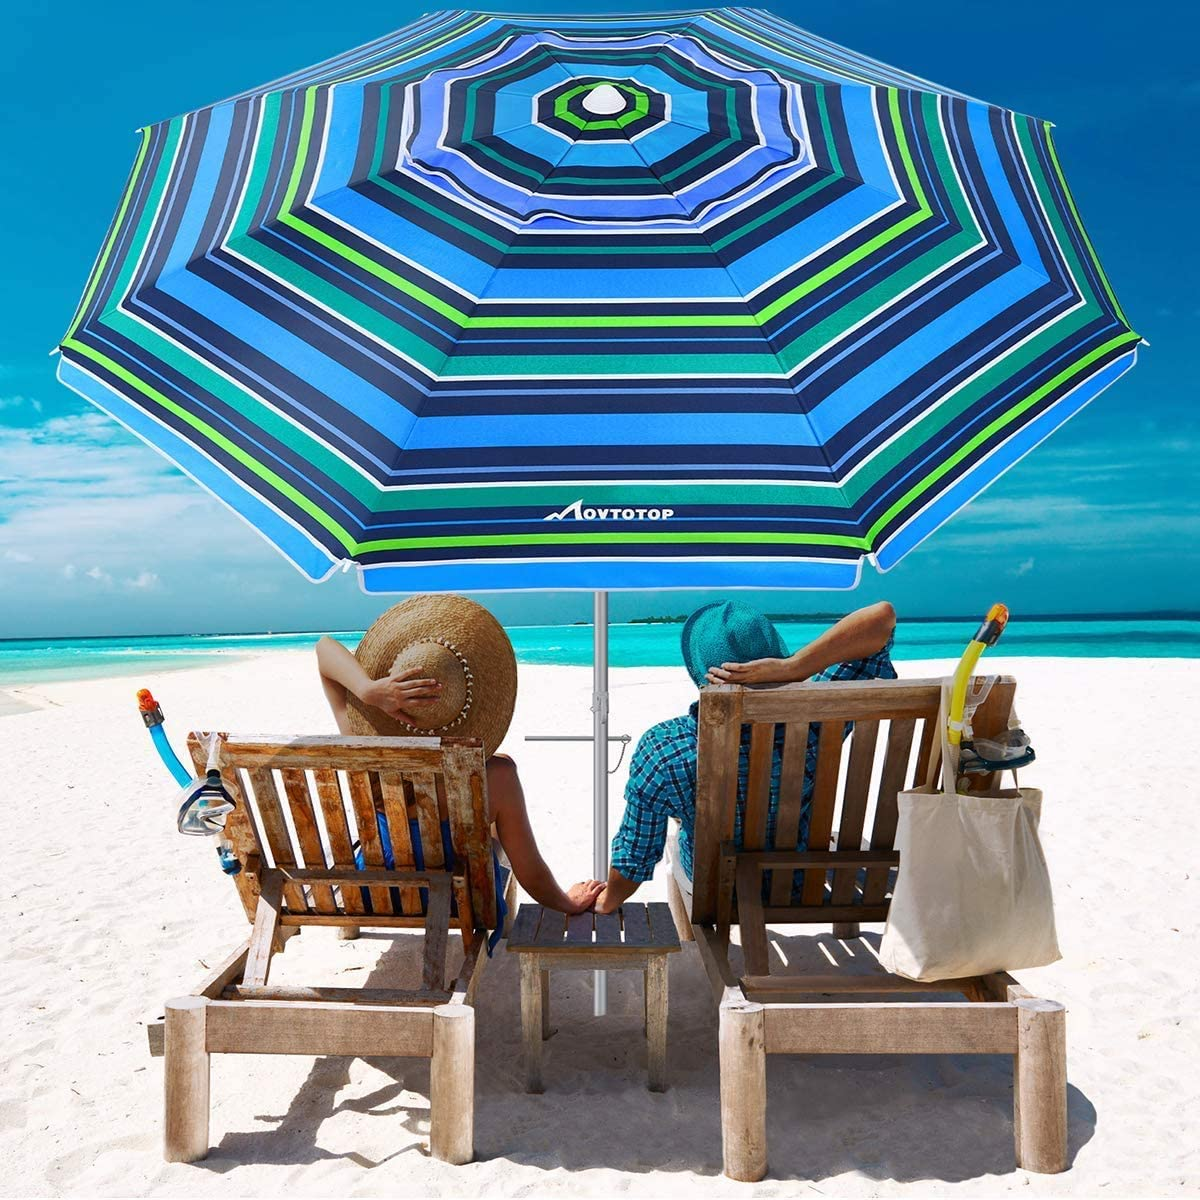 MOVTOTOP Beach Umbrella, 6.5ft Patio Umbrella with Tilt Mechanism, Portable UV 50 Protection Beach Umbrella with Carry Bag for Outdoor Patio